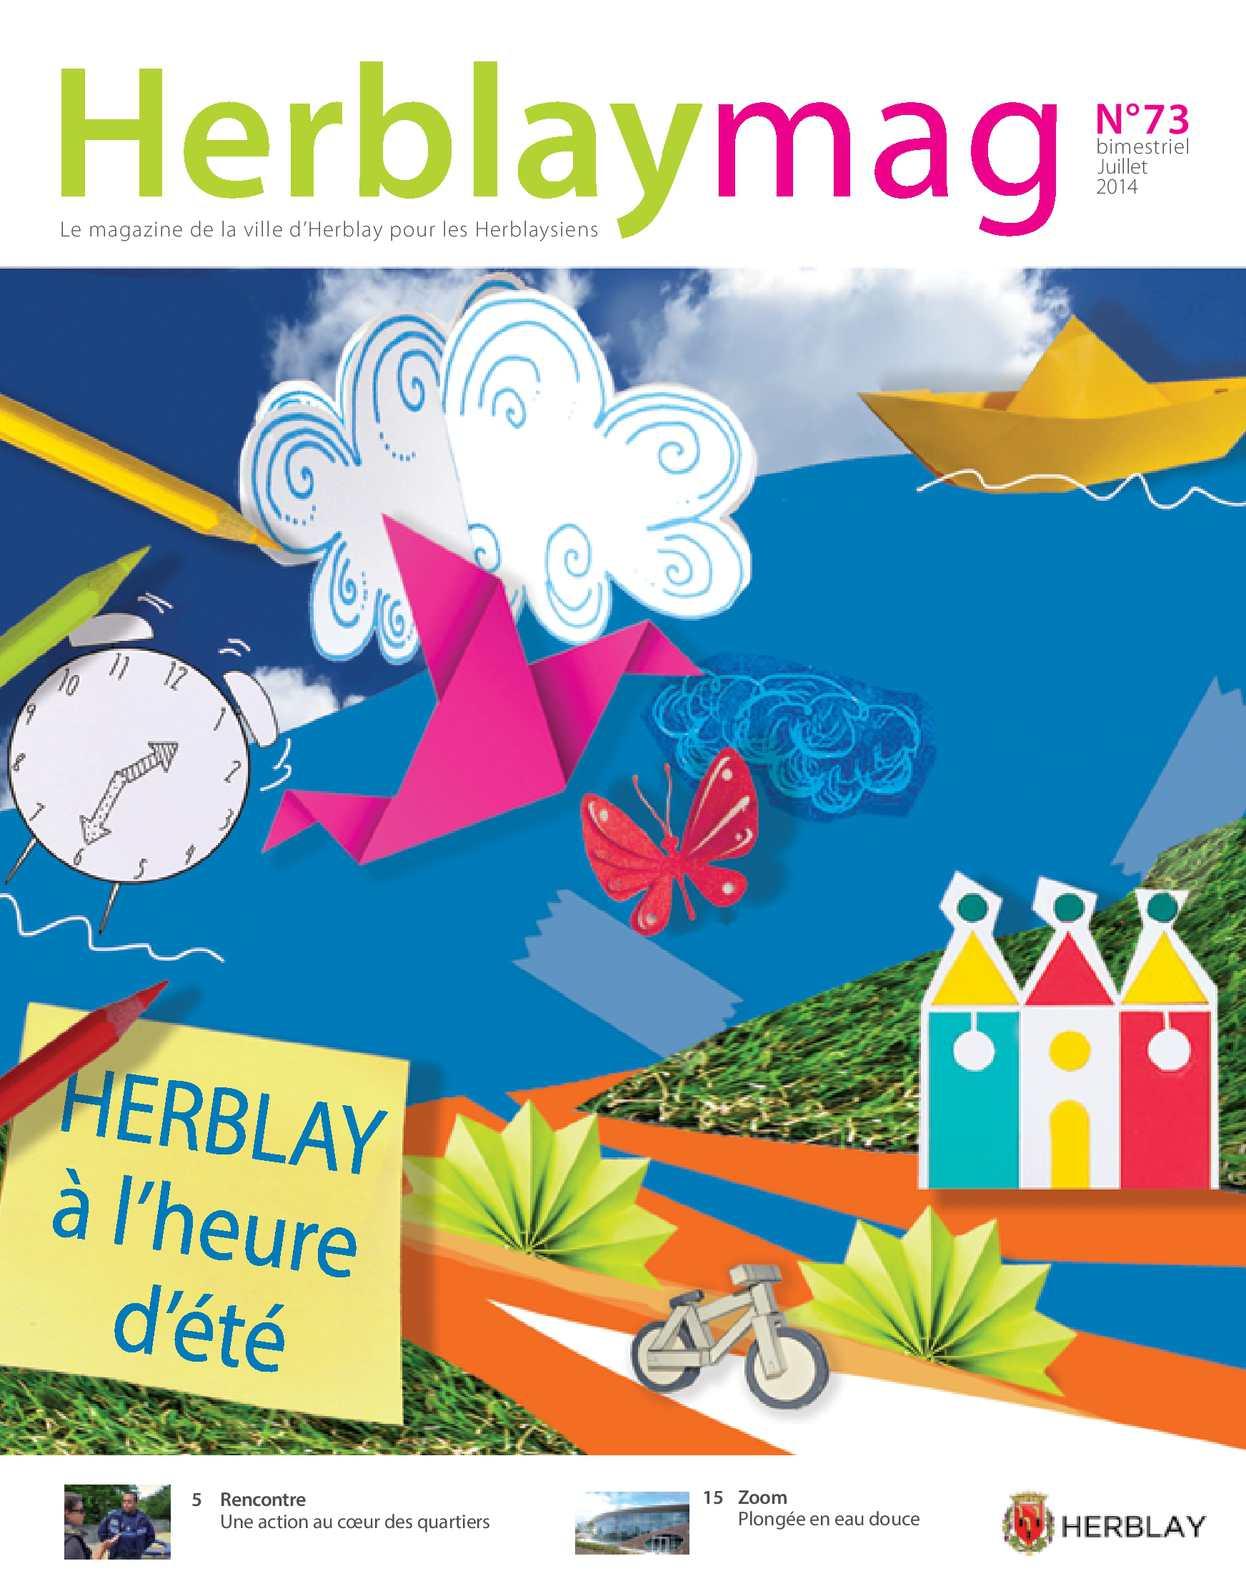 Calam o herblay mag n 73 juillet 2014 for Piscine d herblay